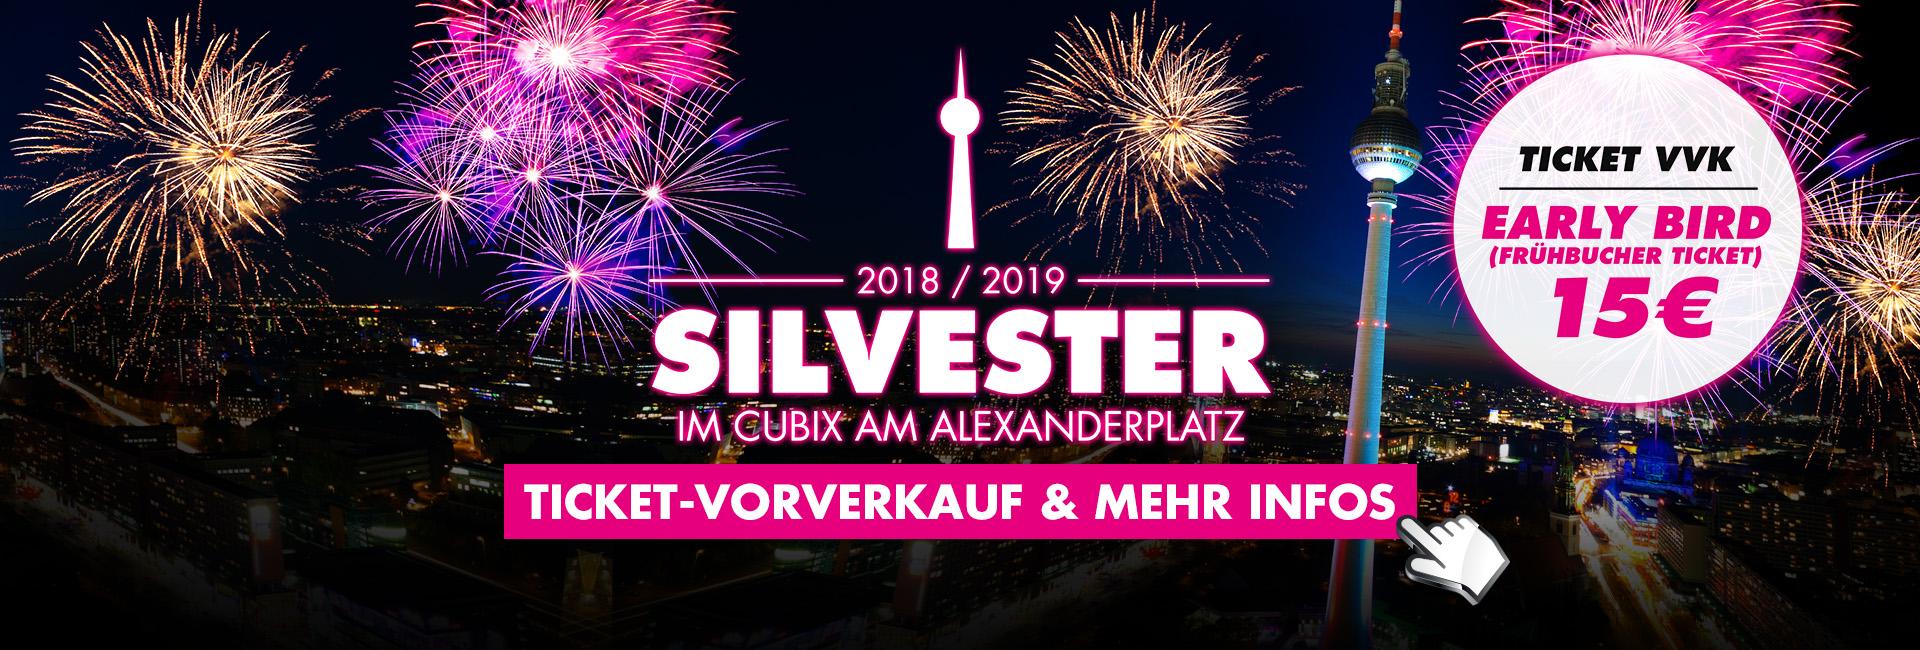 Carambar-Silvester-Slider-1920x650